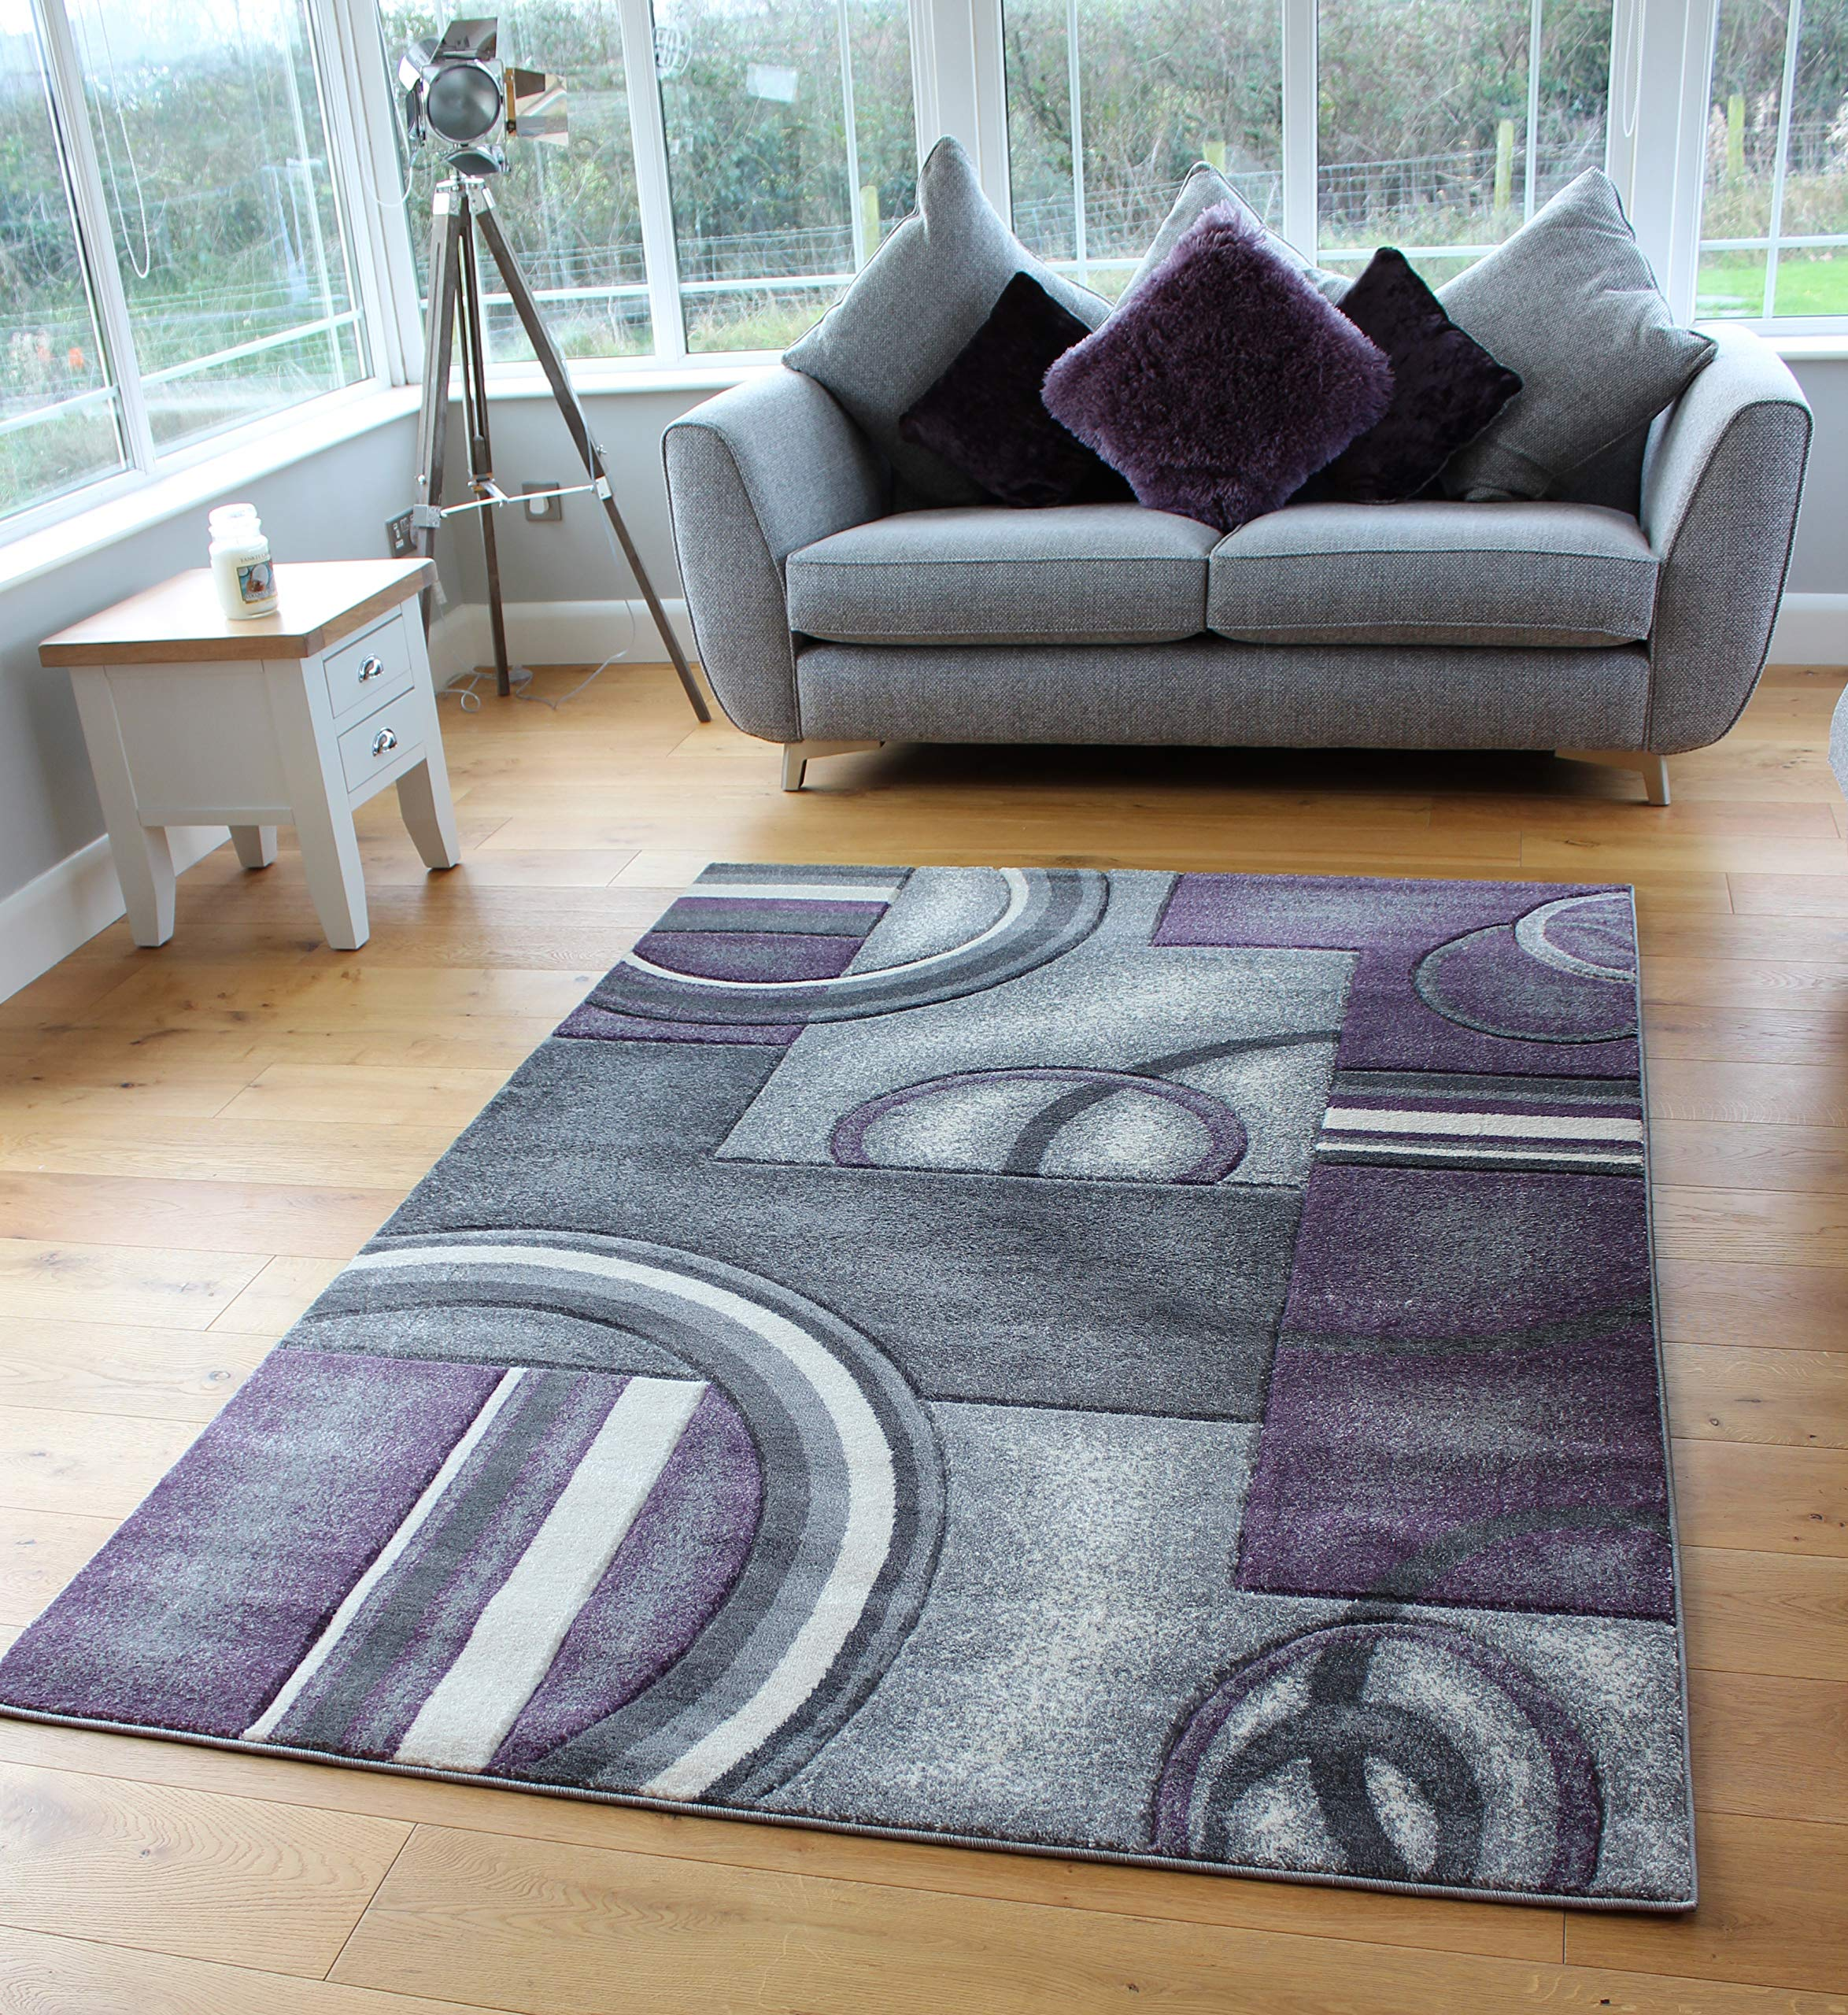 New Large Small Modern Design Soft Grey Silver Runner Rugs Hallway Rug Carpets